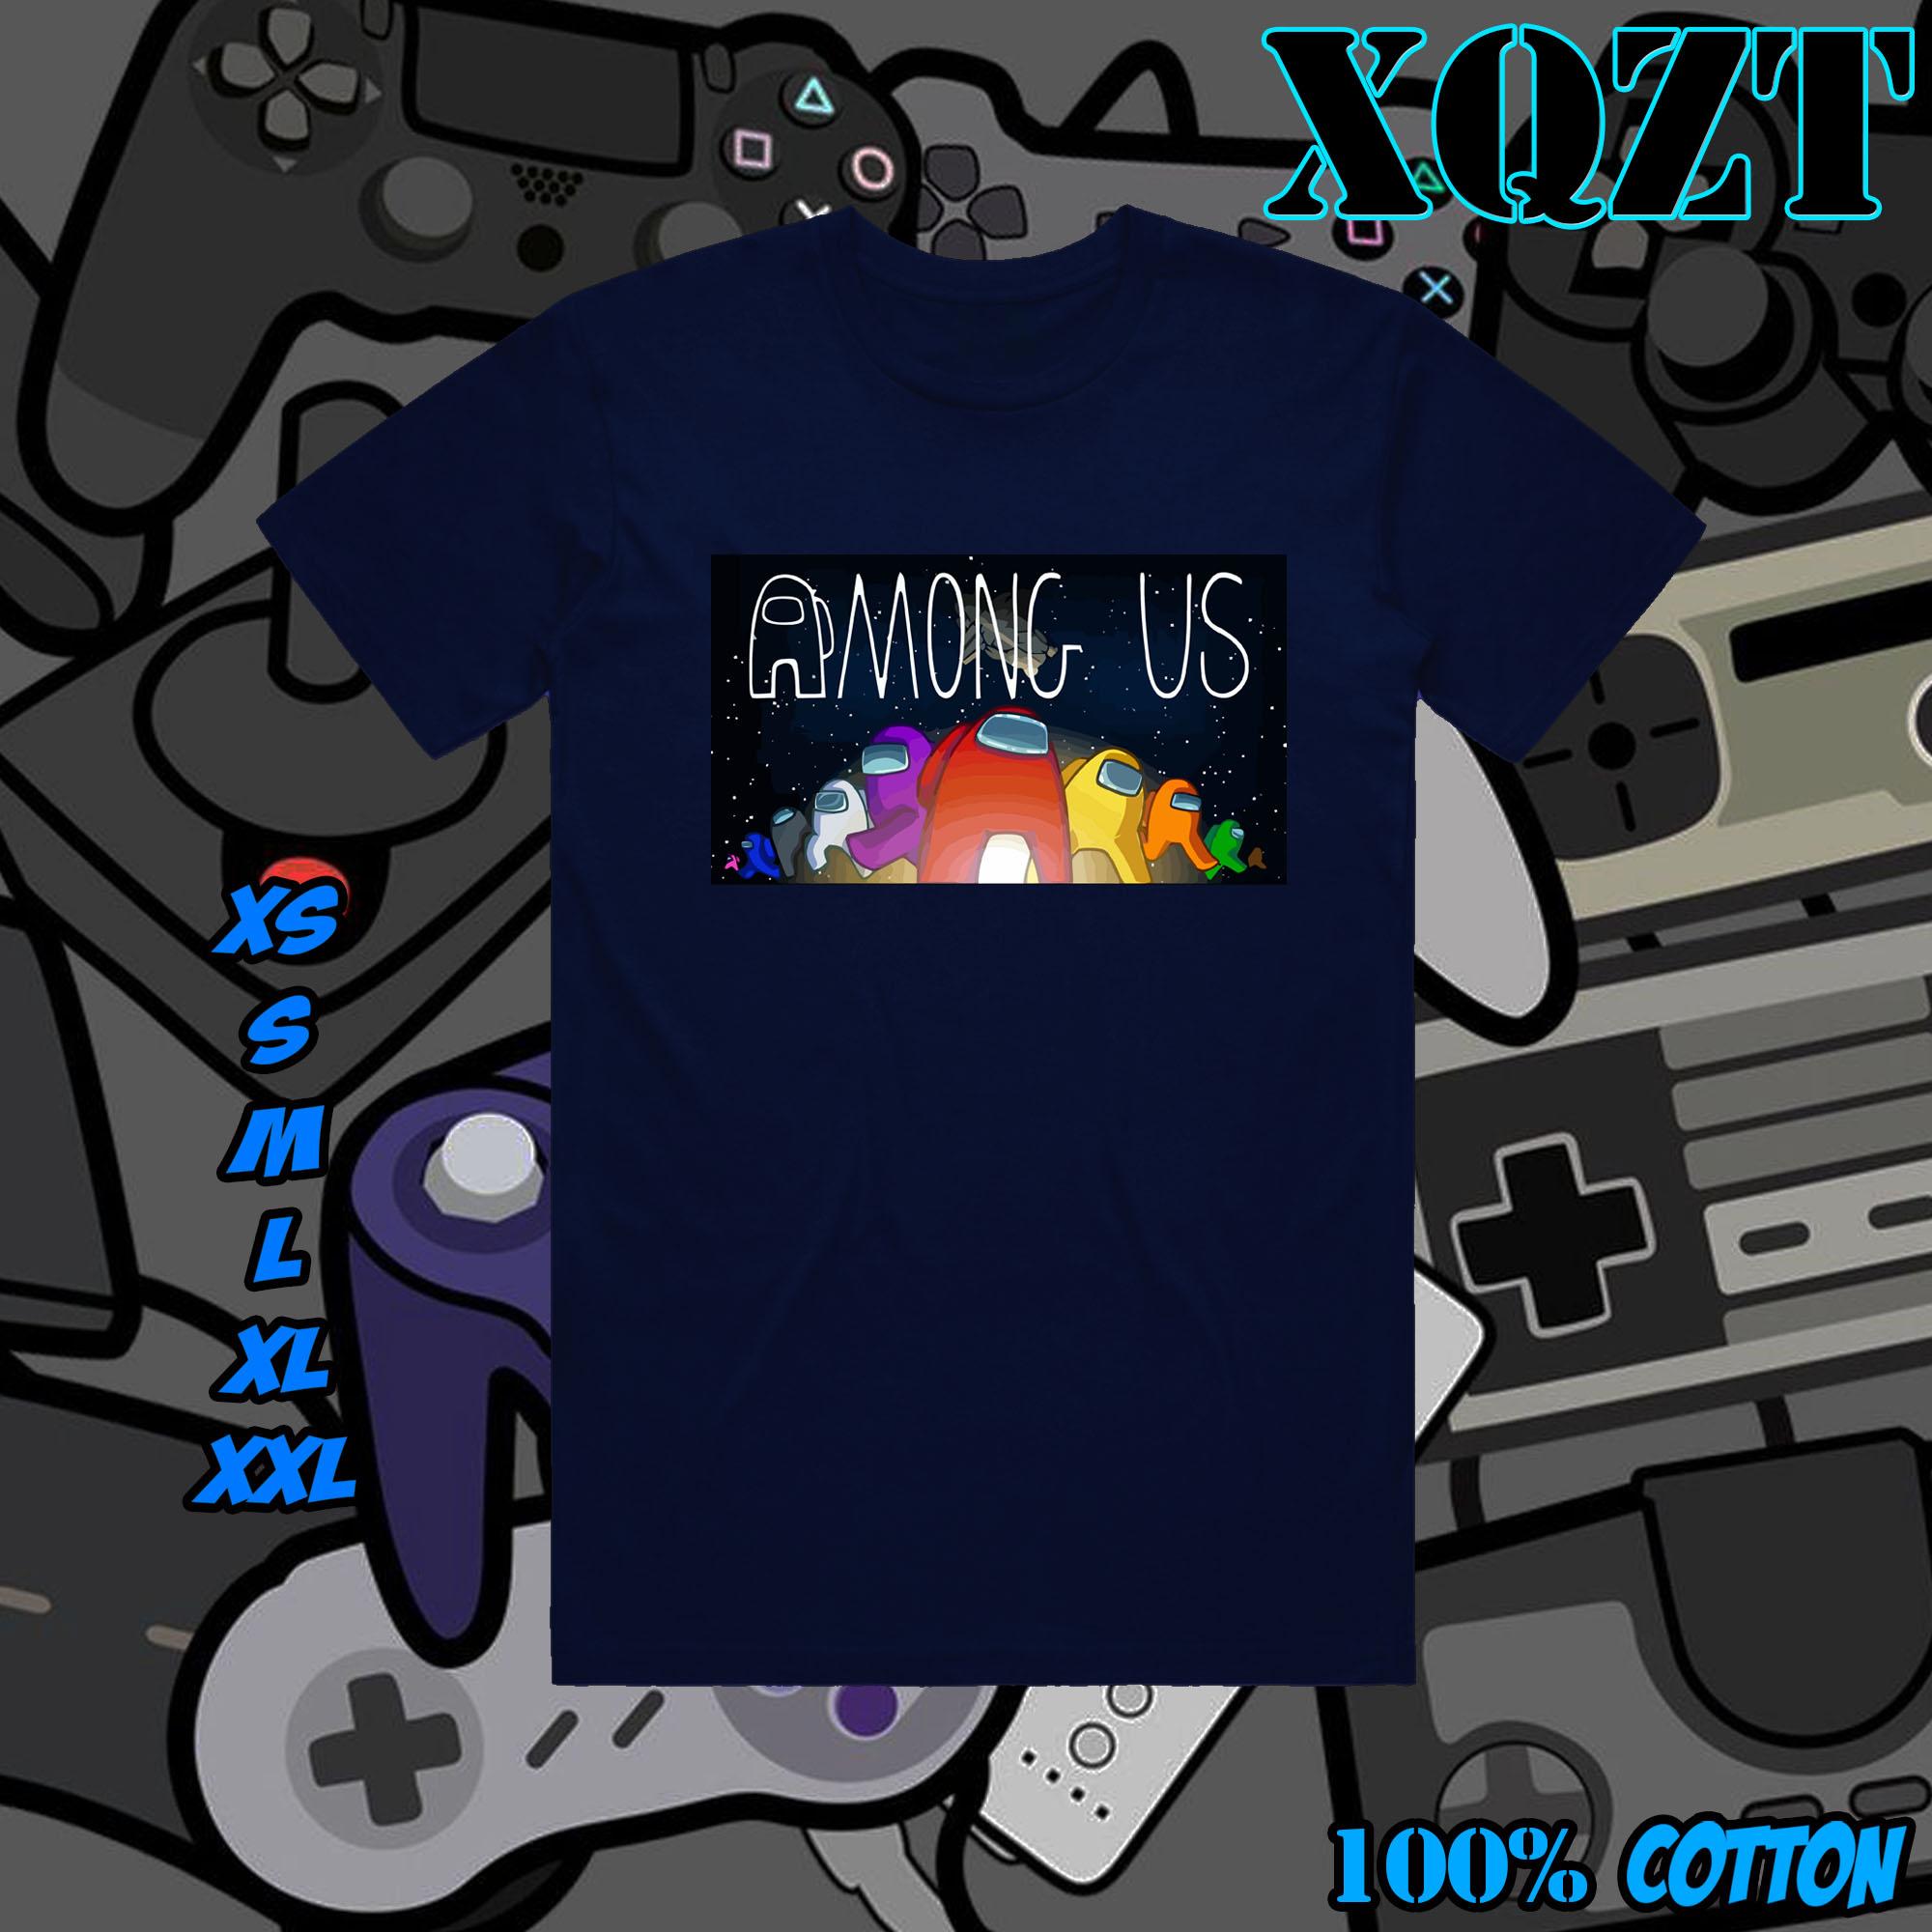 Among Us Game Mobile Games Pc New Trend Design Wallpaper Shirt G2 Lazada Ph